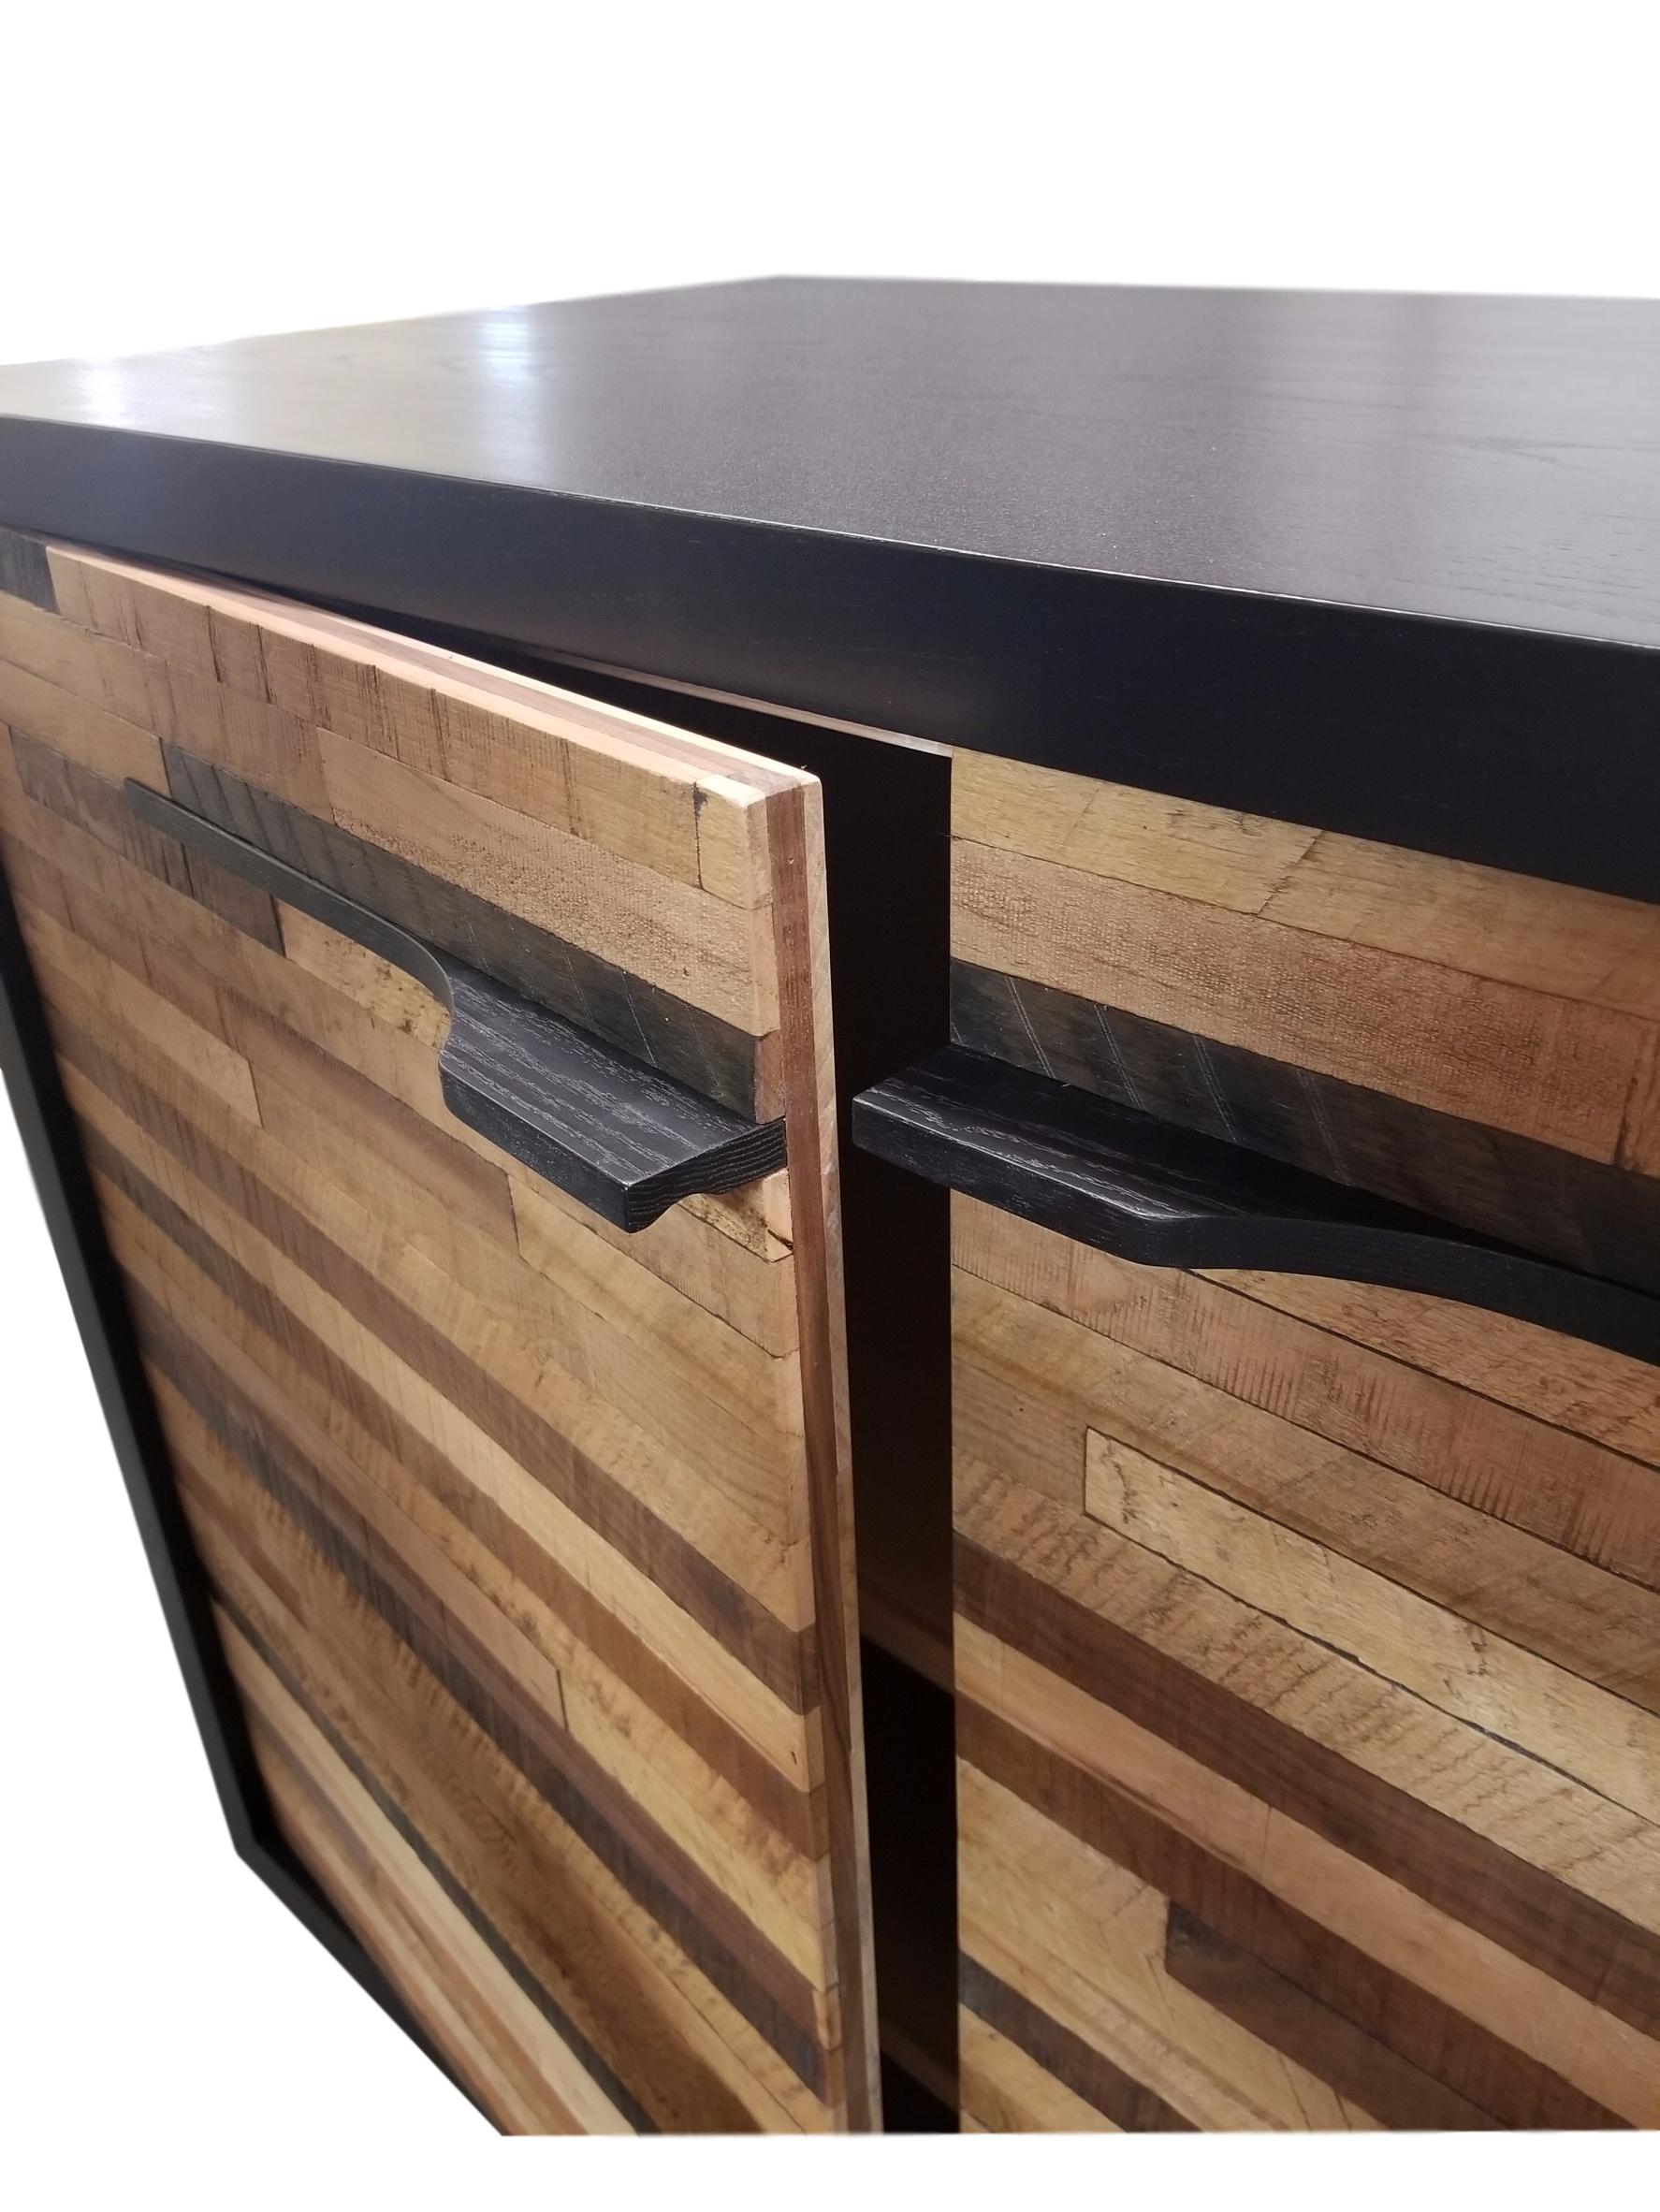 office sideboard. Modern Office Sideboard #sideboard #credenza #console #sideboardsfurniture #sideboardsideas #sideboardsandcabinets #